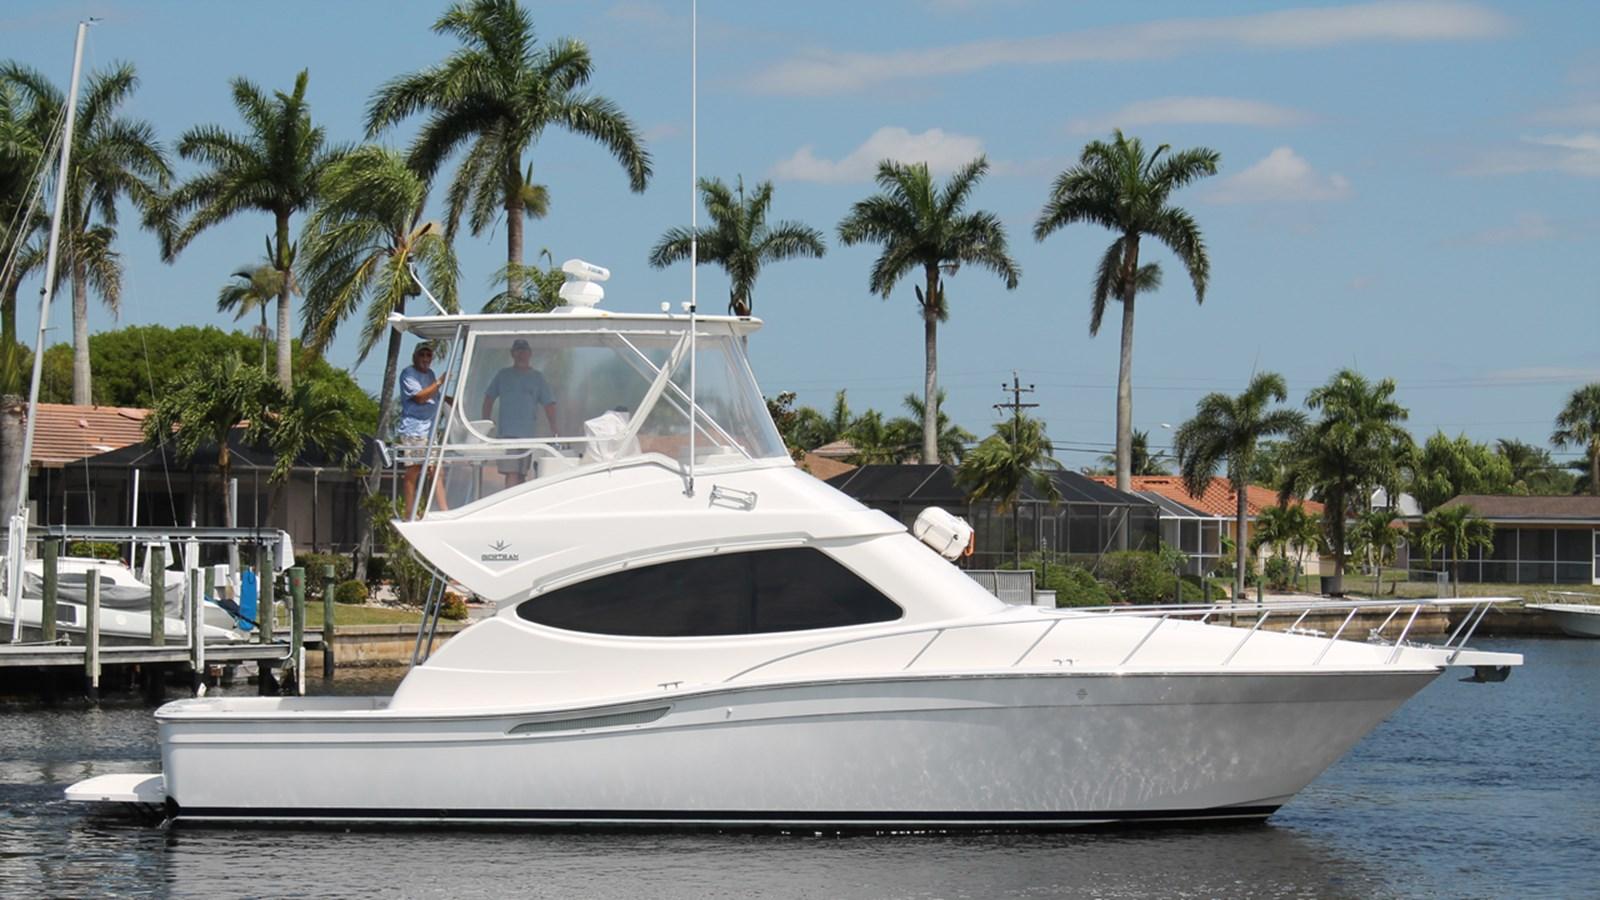 2011 BERTRAM 410 Convertible For Sale